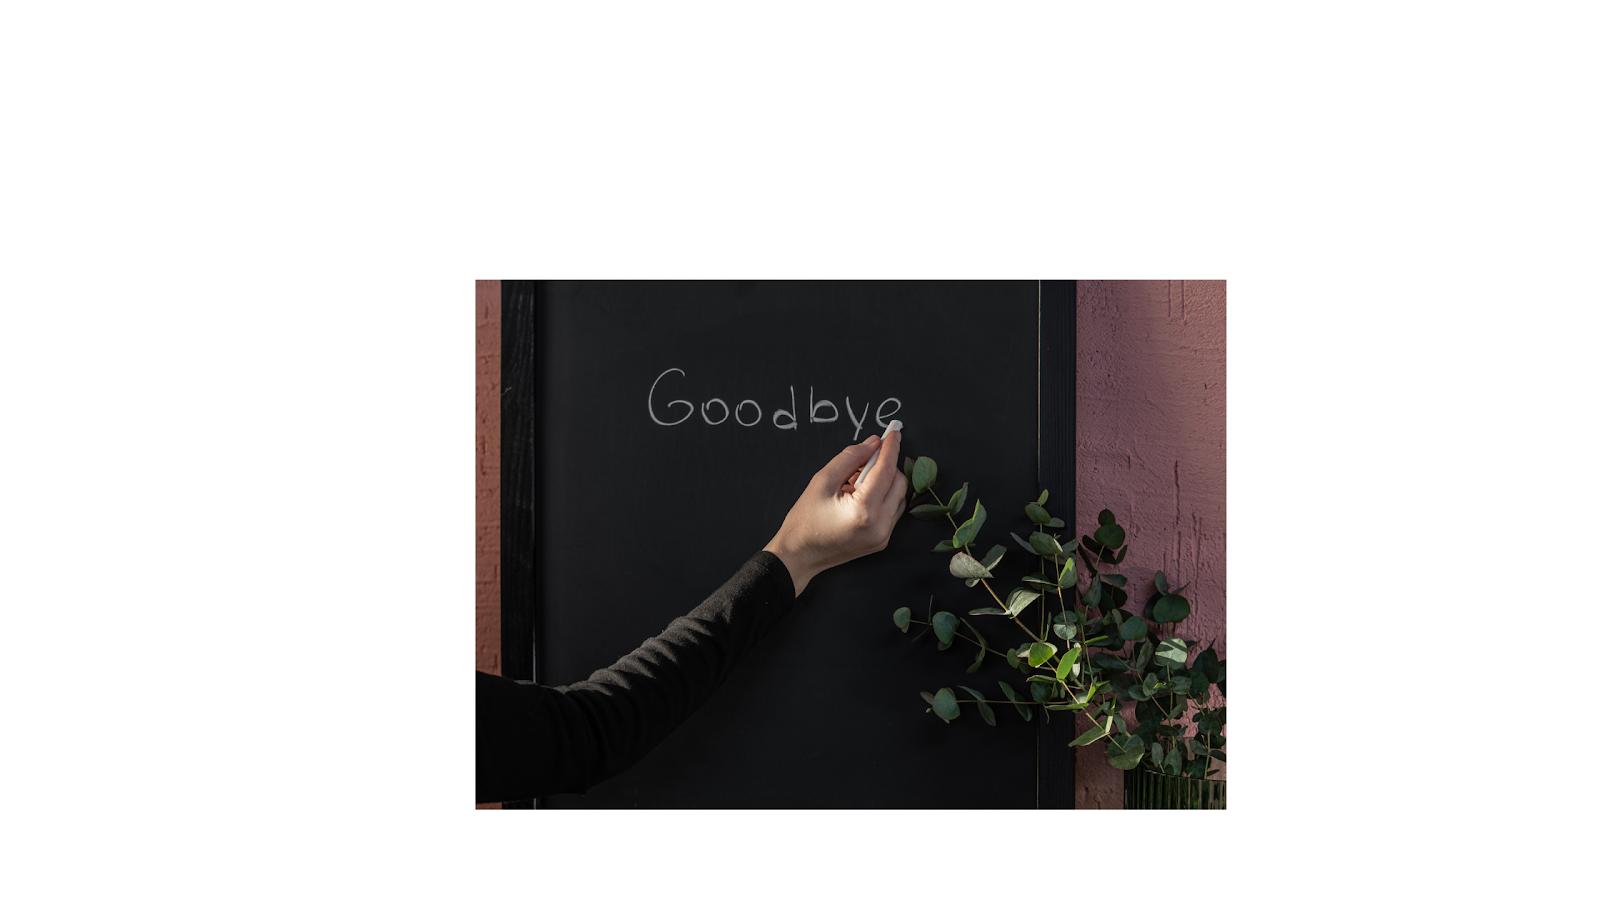 Writing good bye